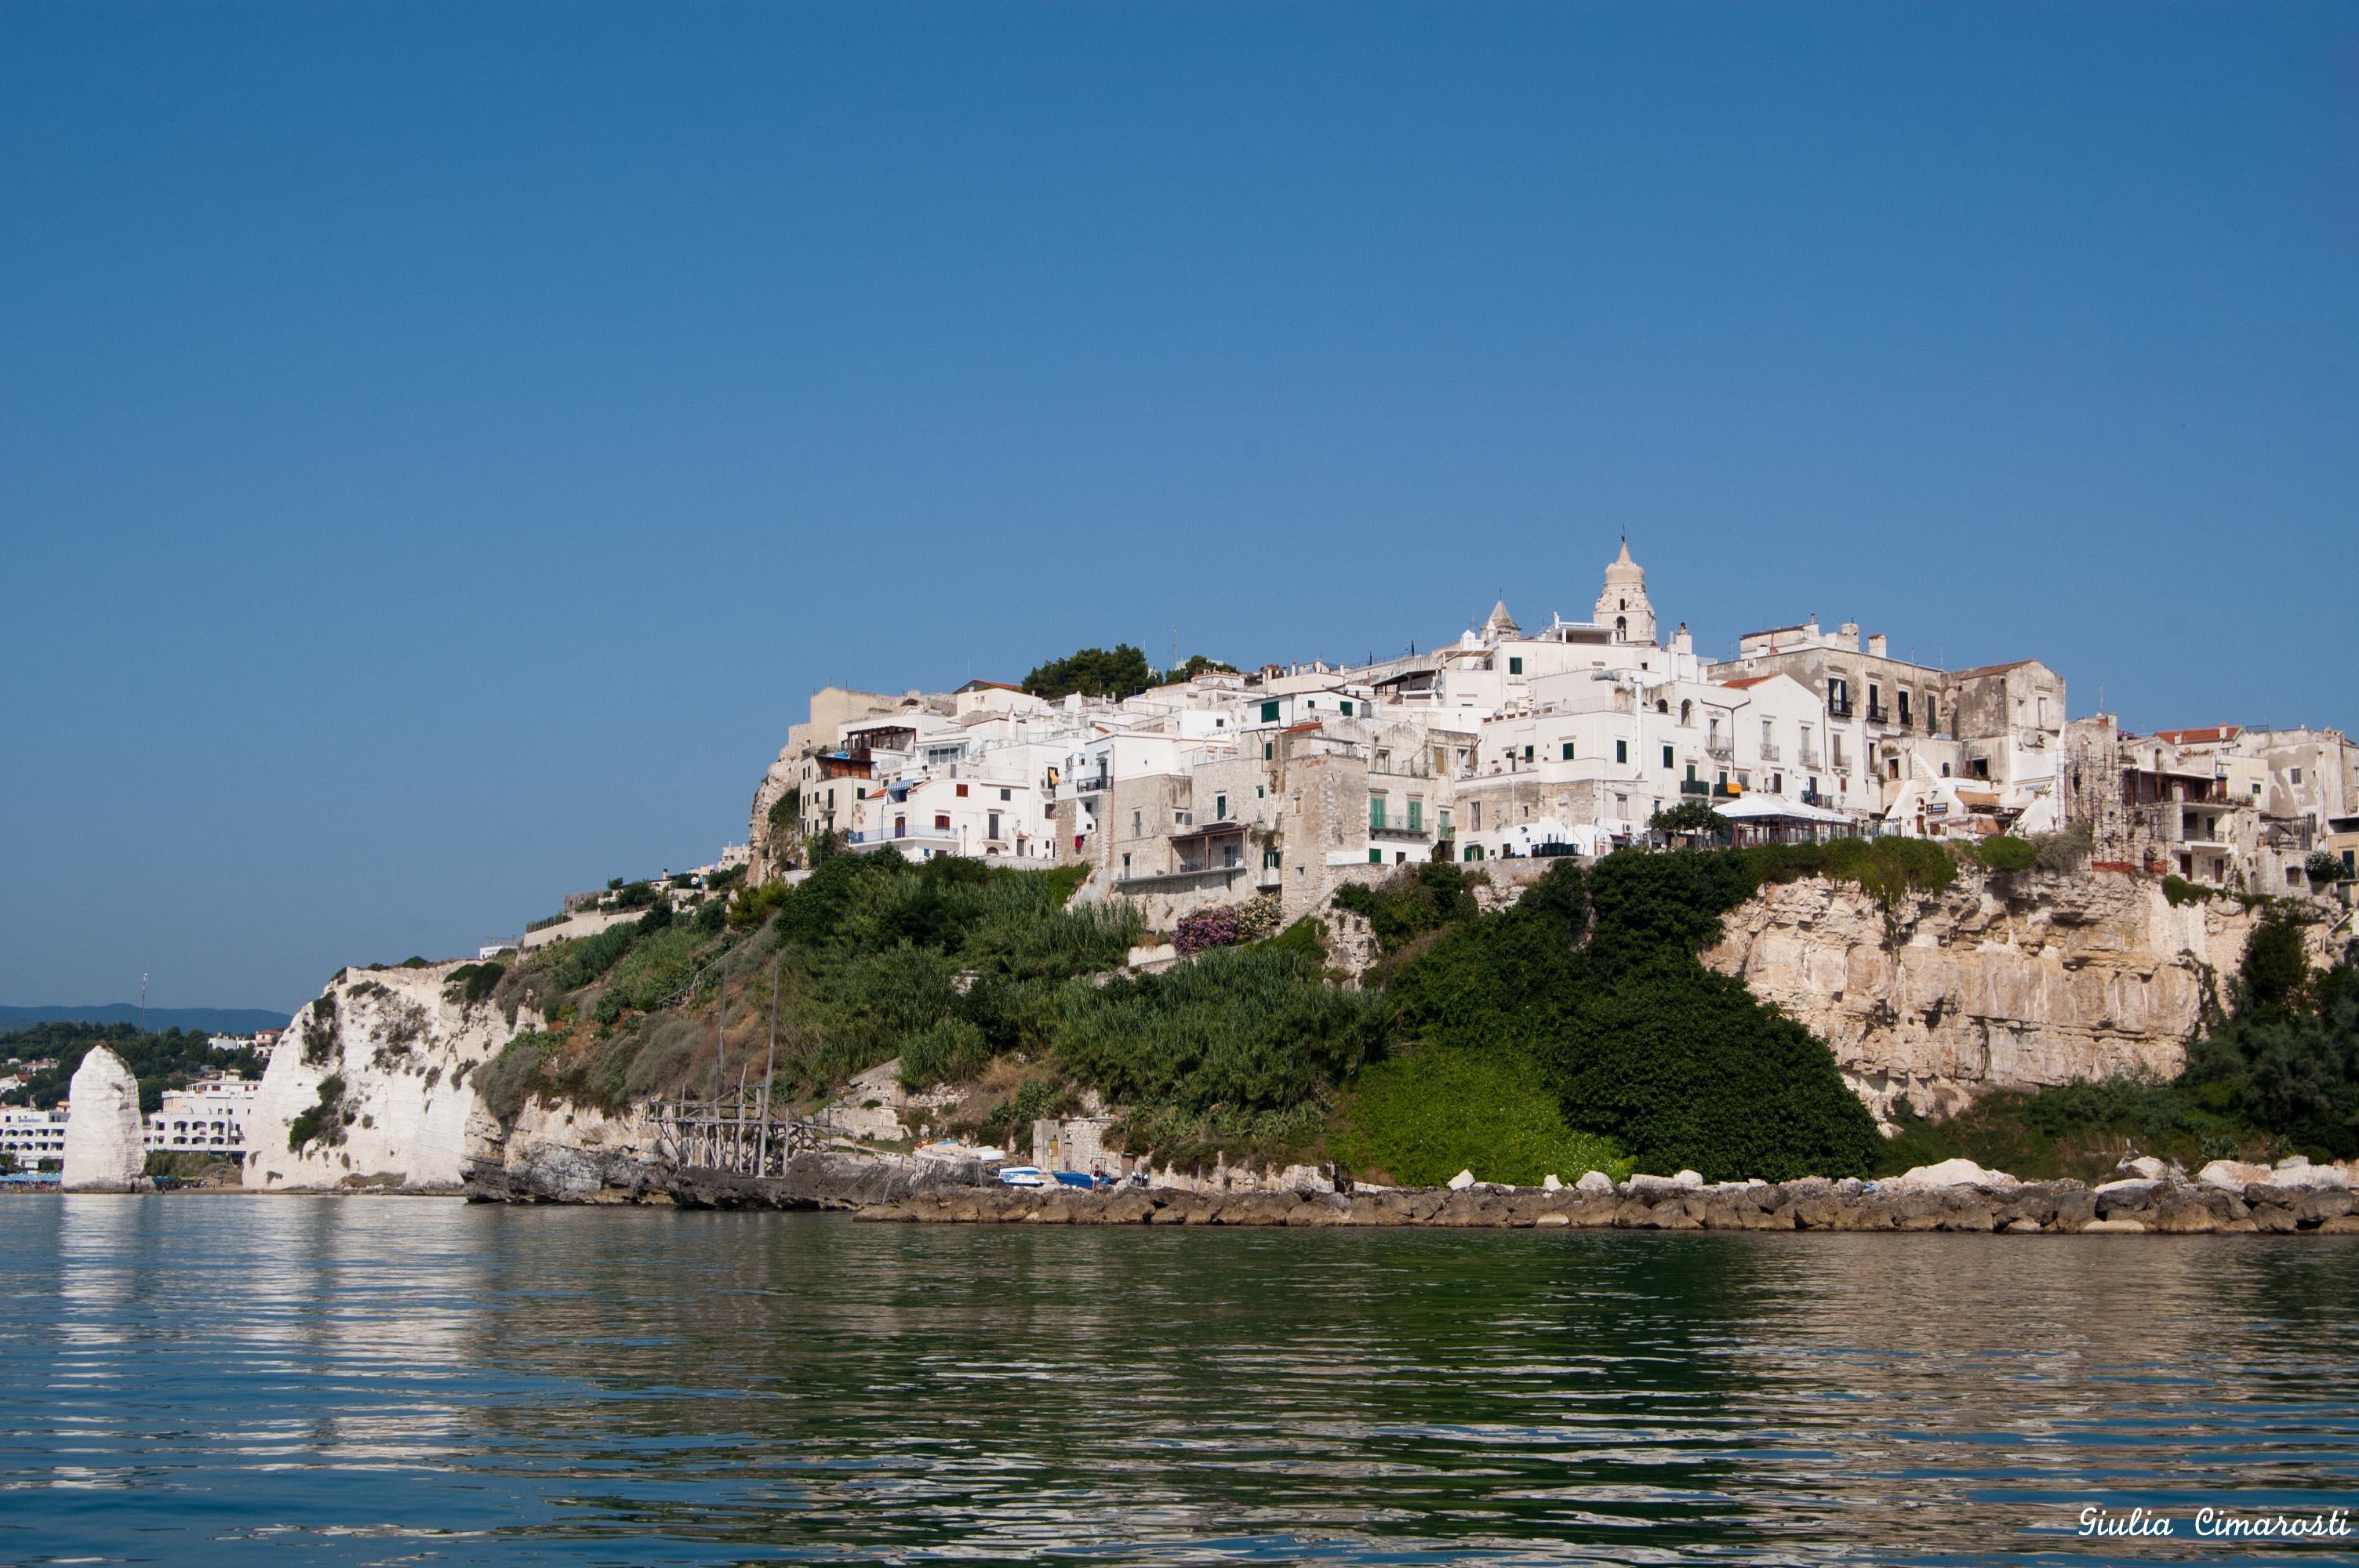 Vieste, Apulia, Italy